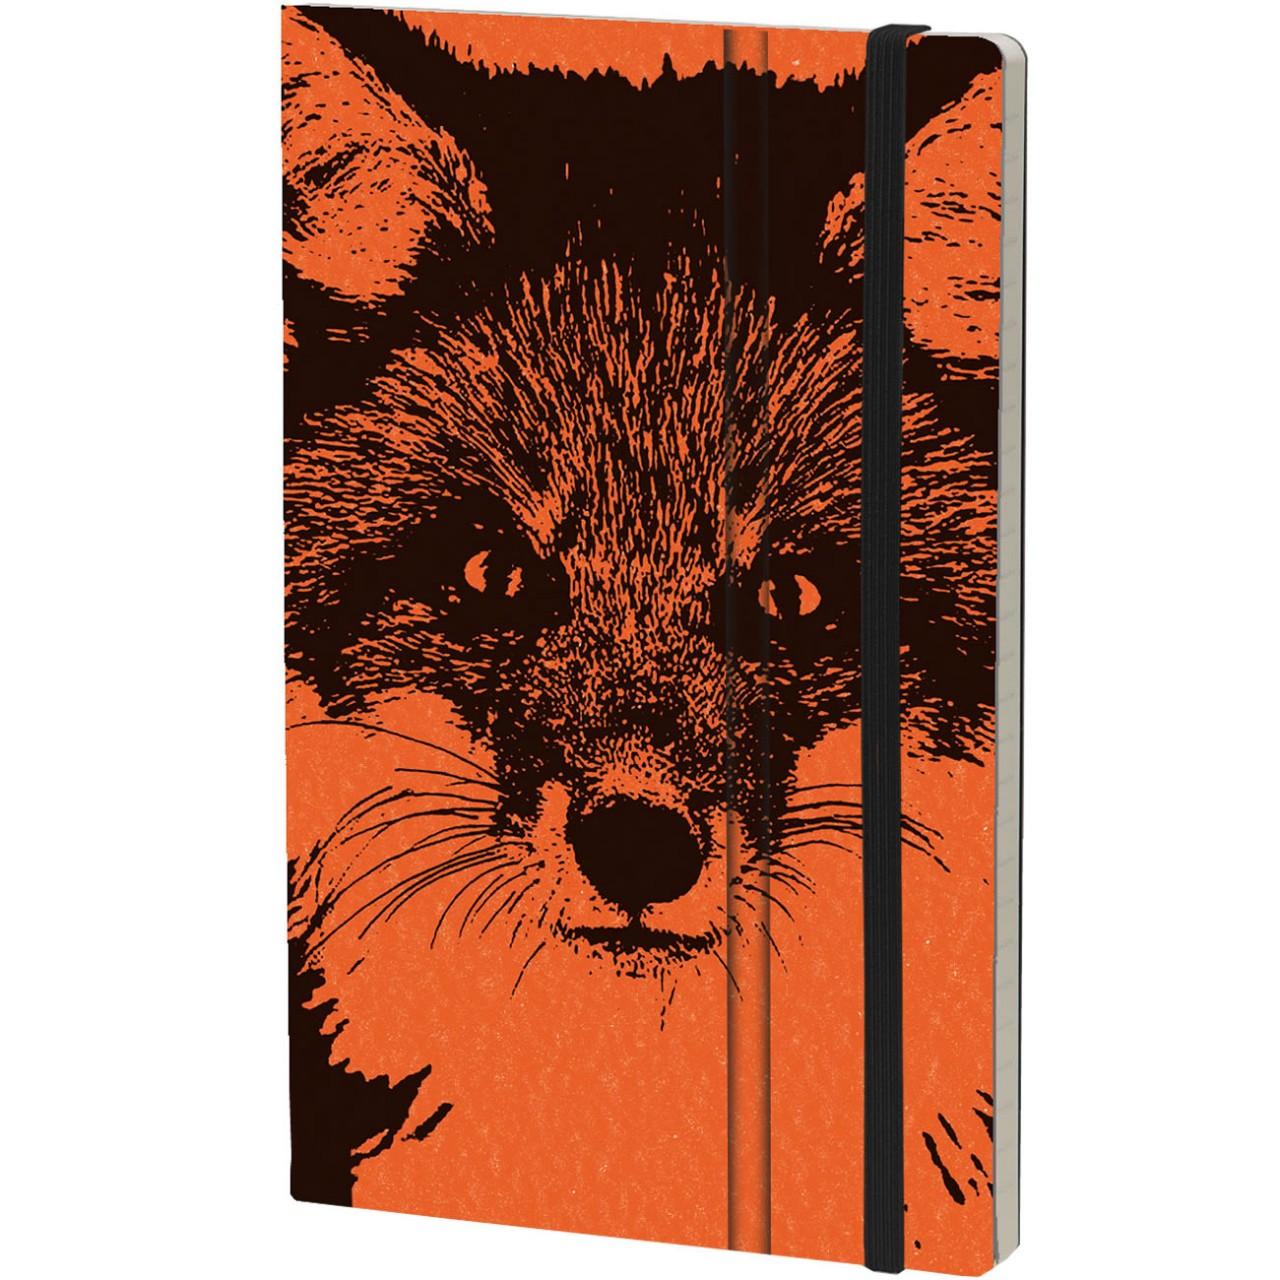 Stifflexible Notizbuch WILD PEARL 13 x 21 cm 192 S., FOX